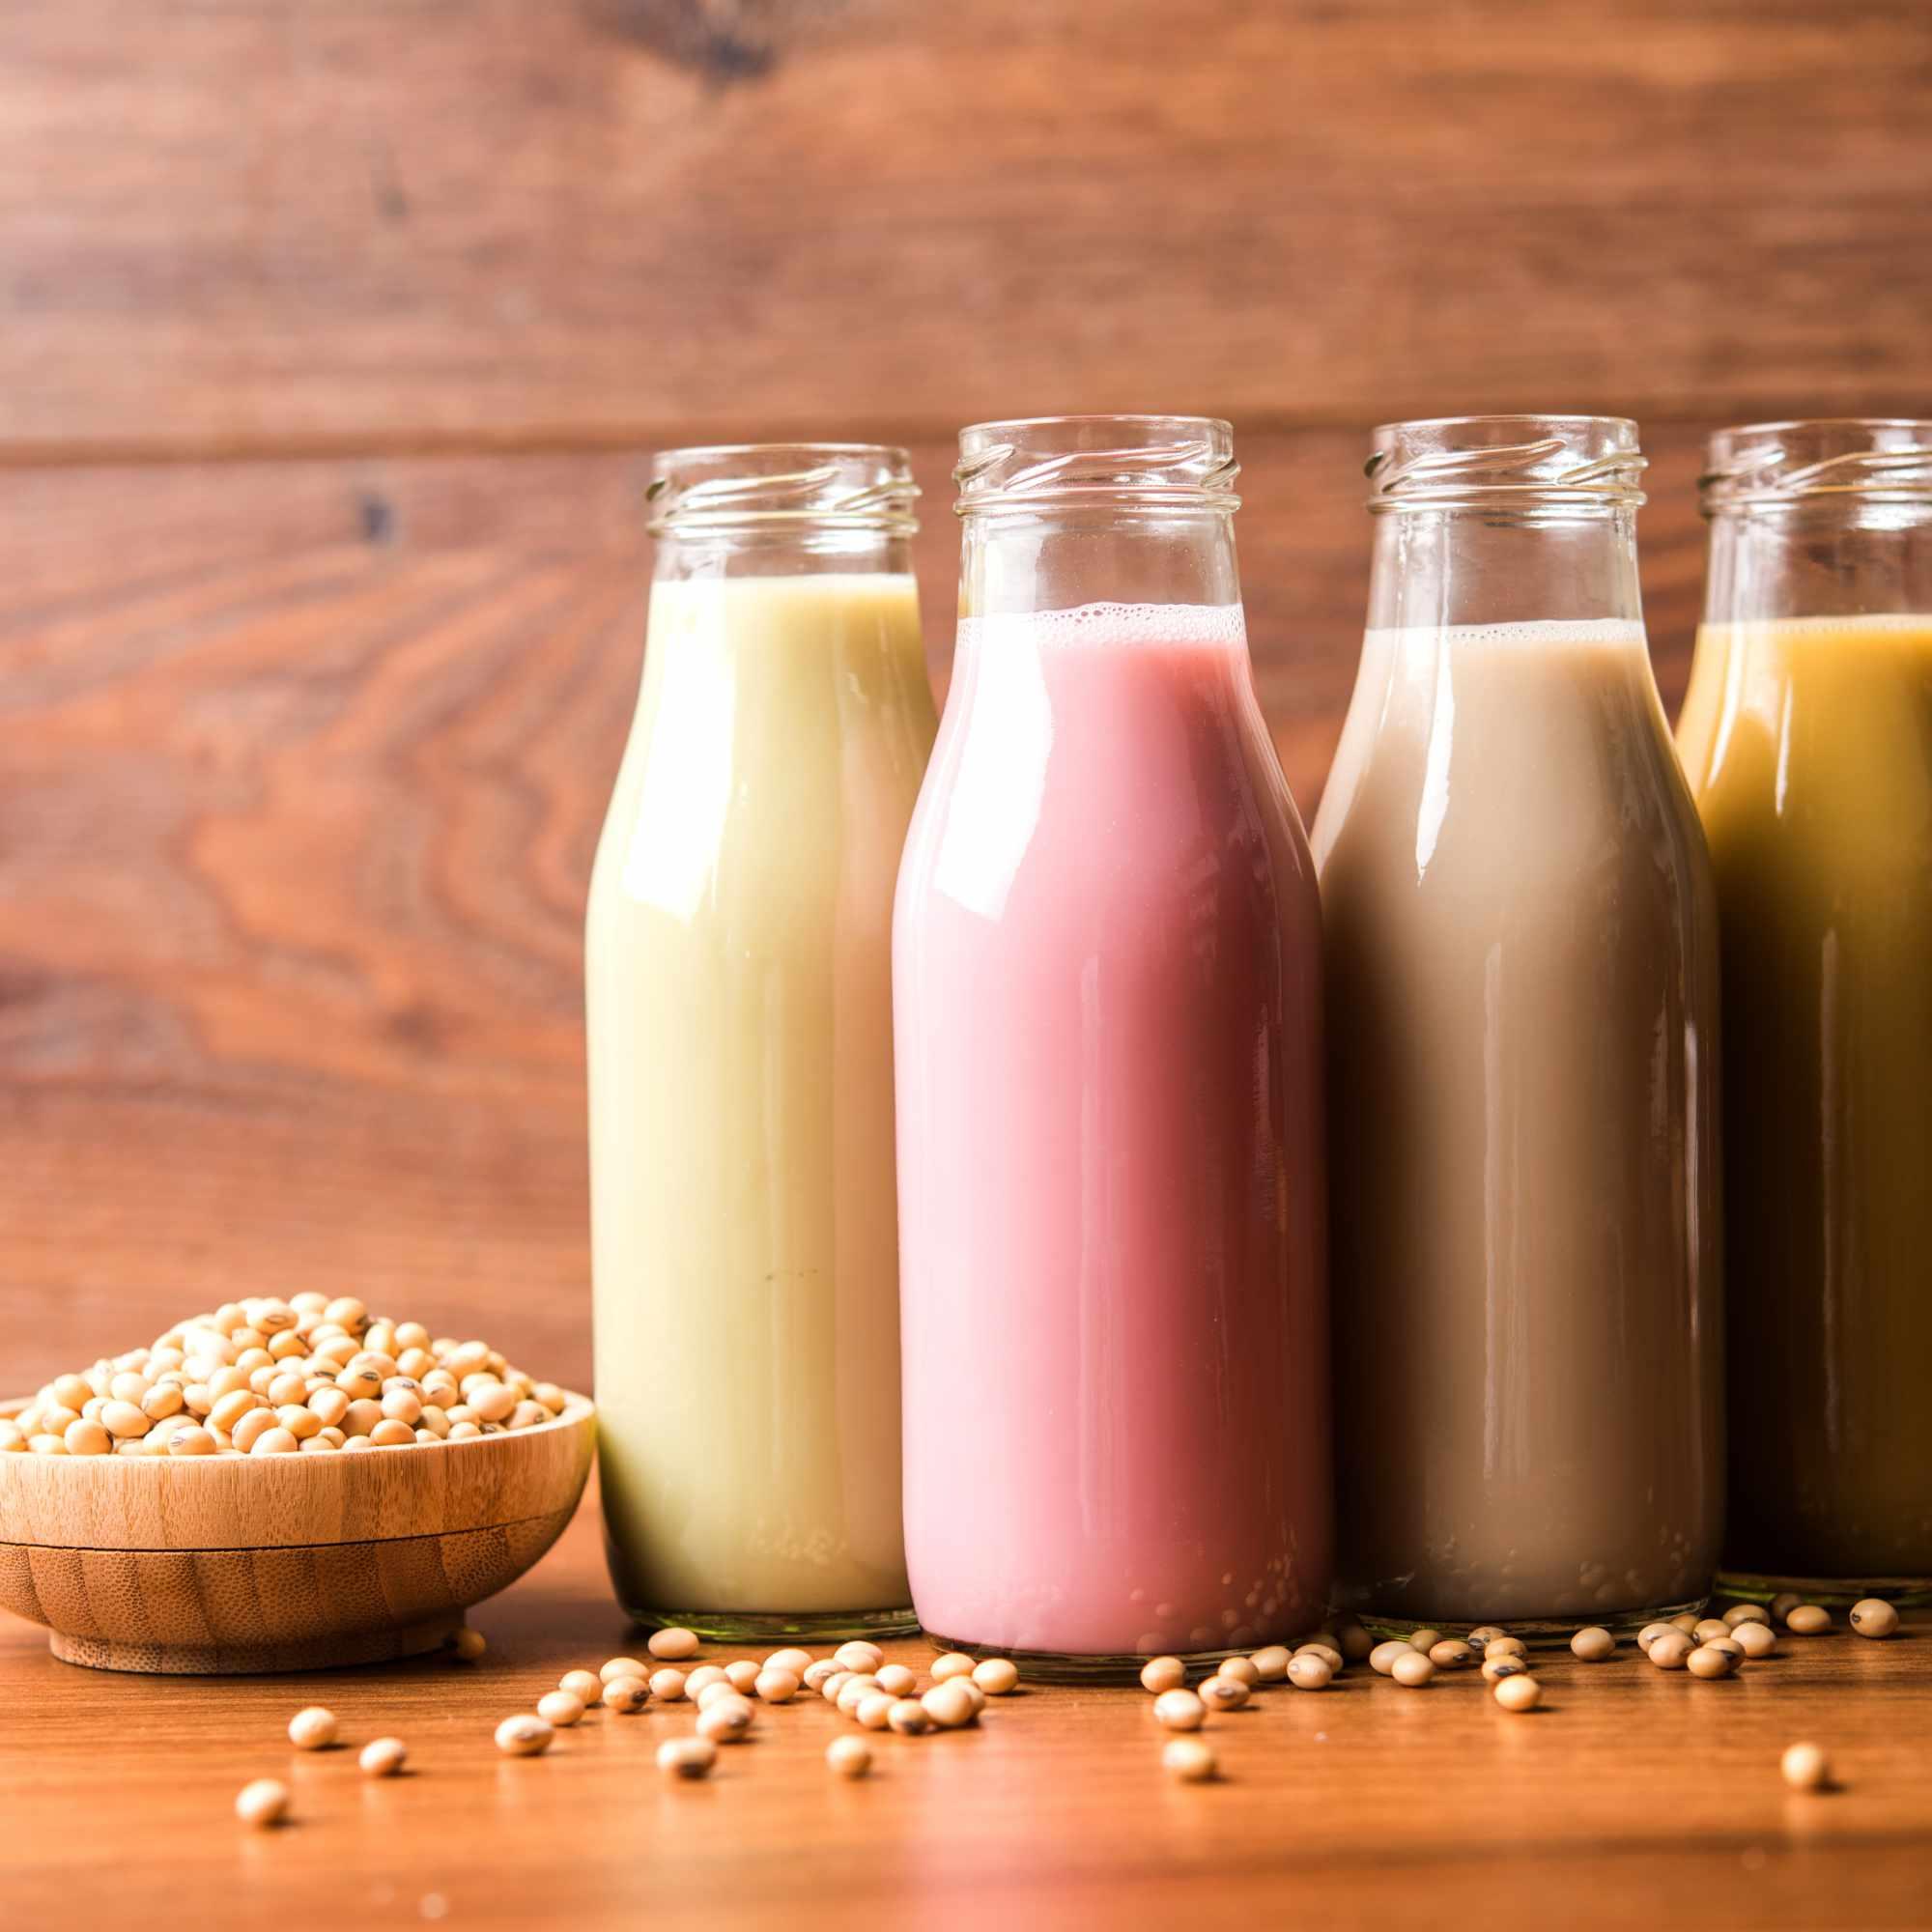 soy-milk-XGPDCZC.jpg